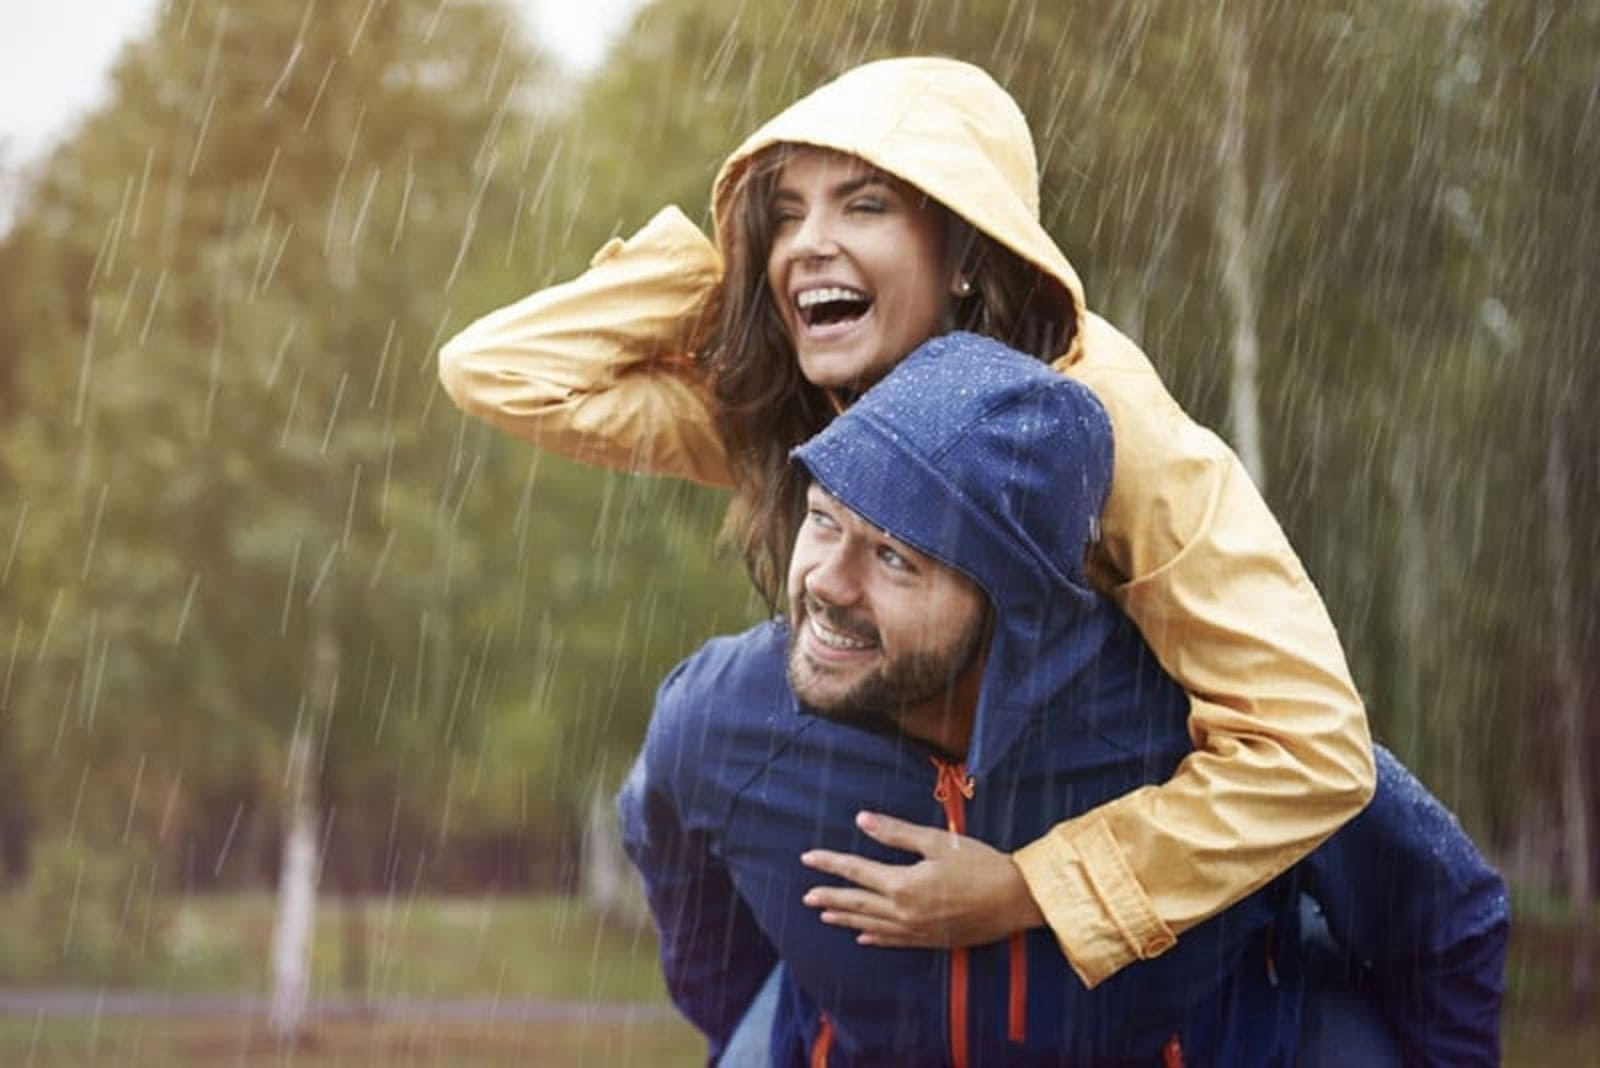 a man carries a woman in the rain